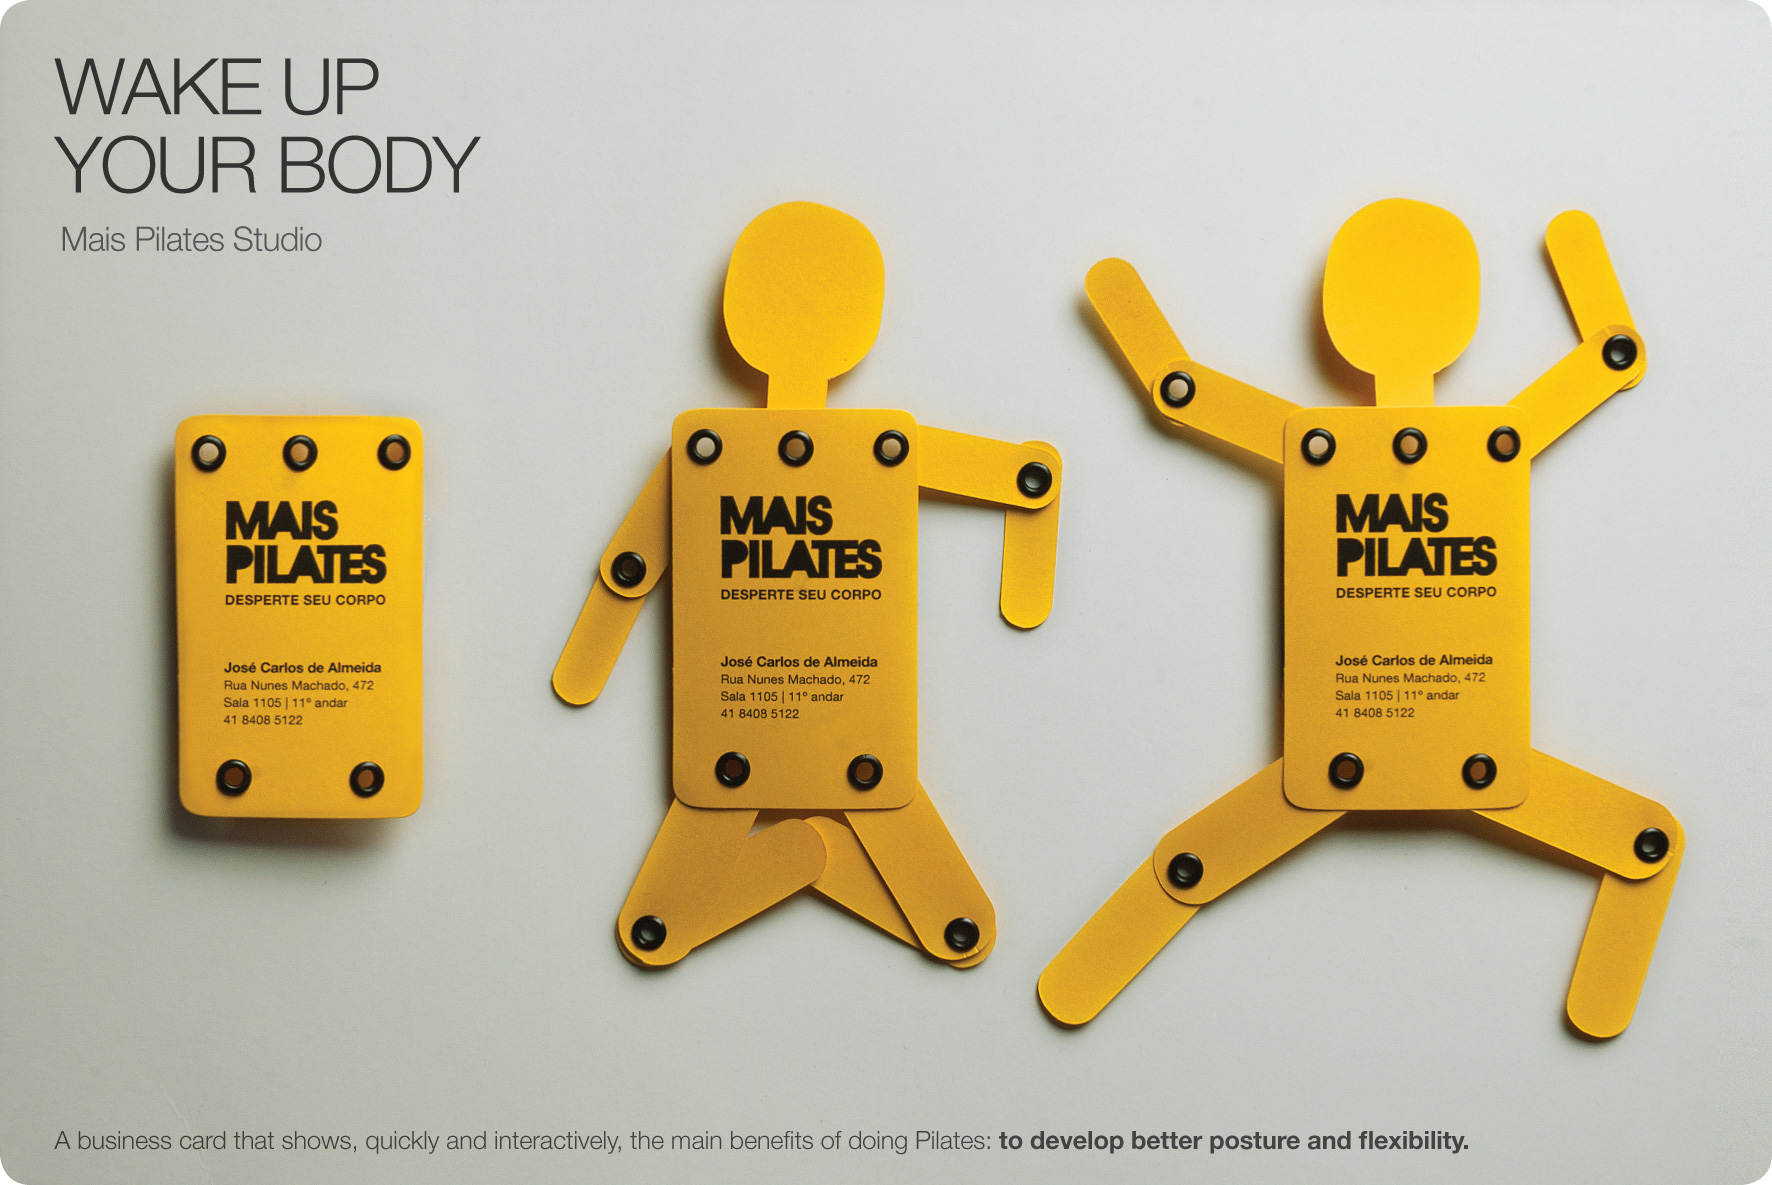 Mais-Pilates-Studio-Wake-Up-Your-Body-Business-Card | Just Creative Ads